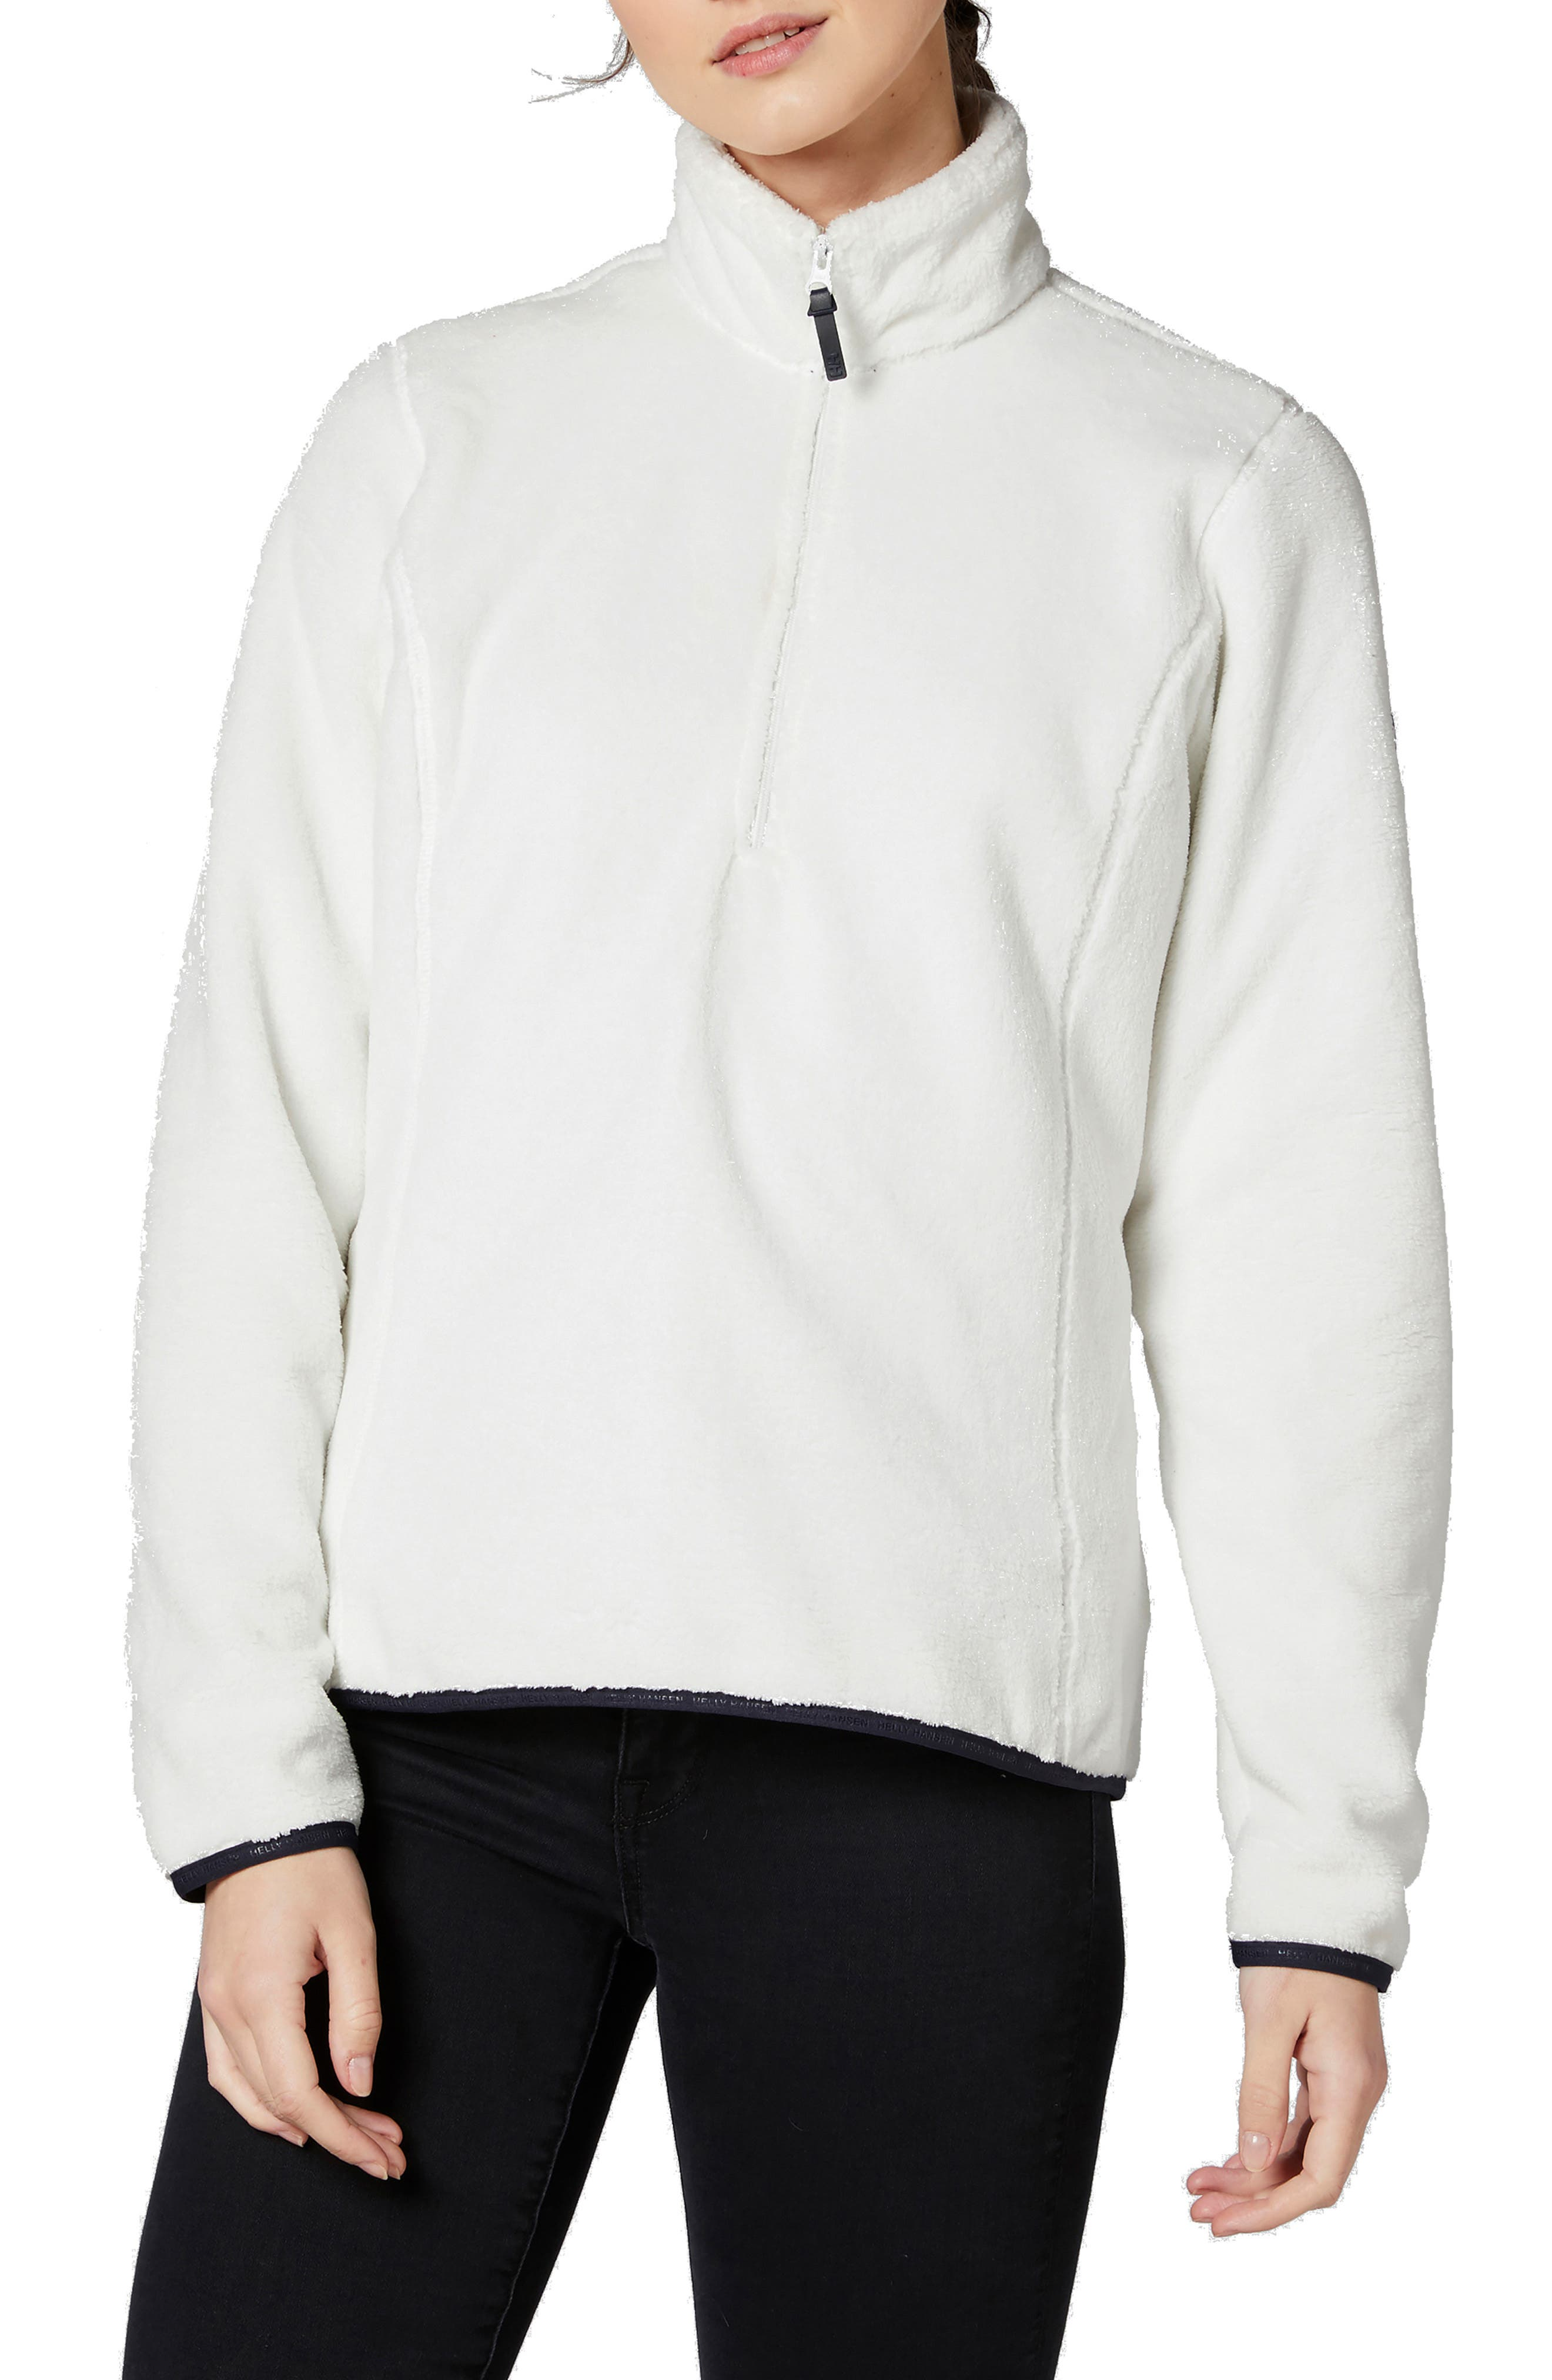 HELLY HANSEN Feather Quarter Zip Fleece in Off White